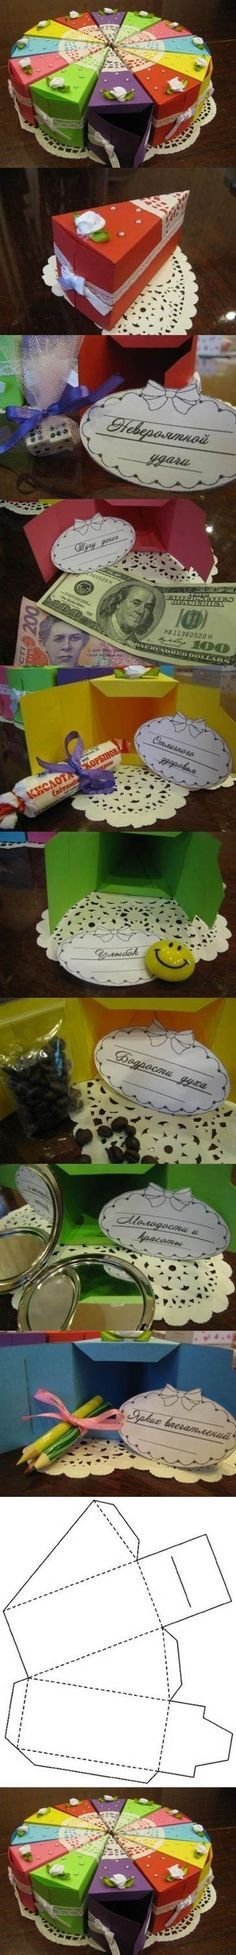 DIY Cake Shaped Gift Boxes   iCreativeIdeas.com Like Us on Facebook ==> https://www.facebook.com/icreativeideas: